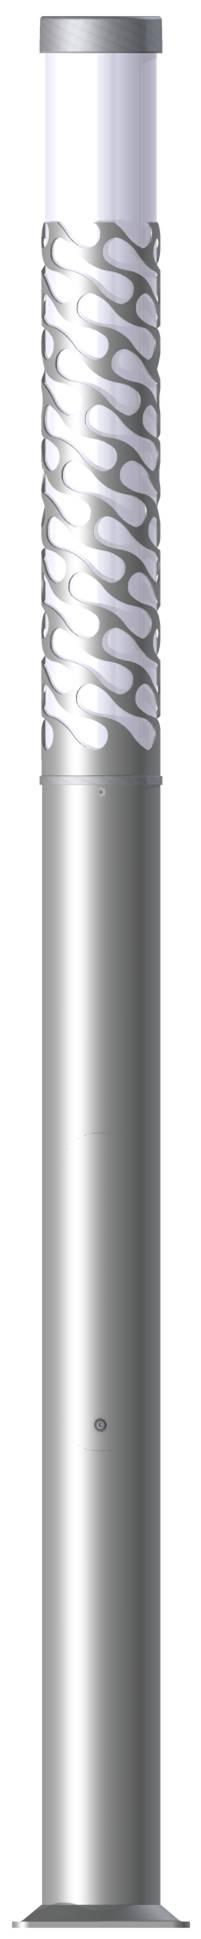 COLONNE LED KARIN DECOR 2400 LED